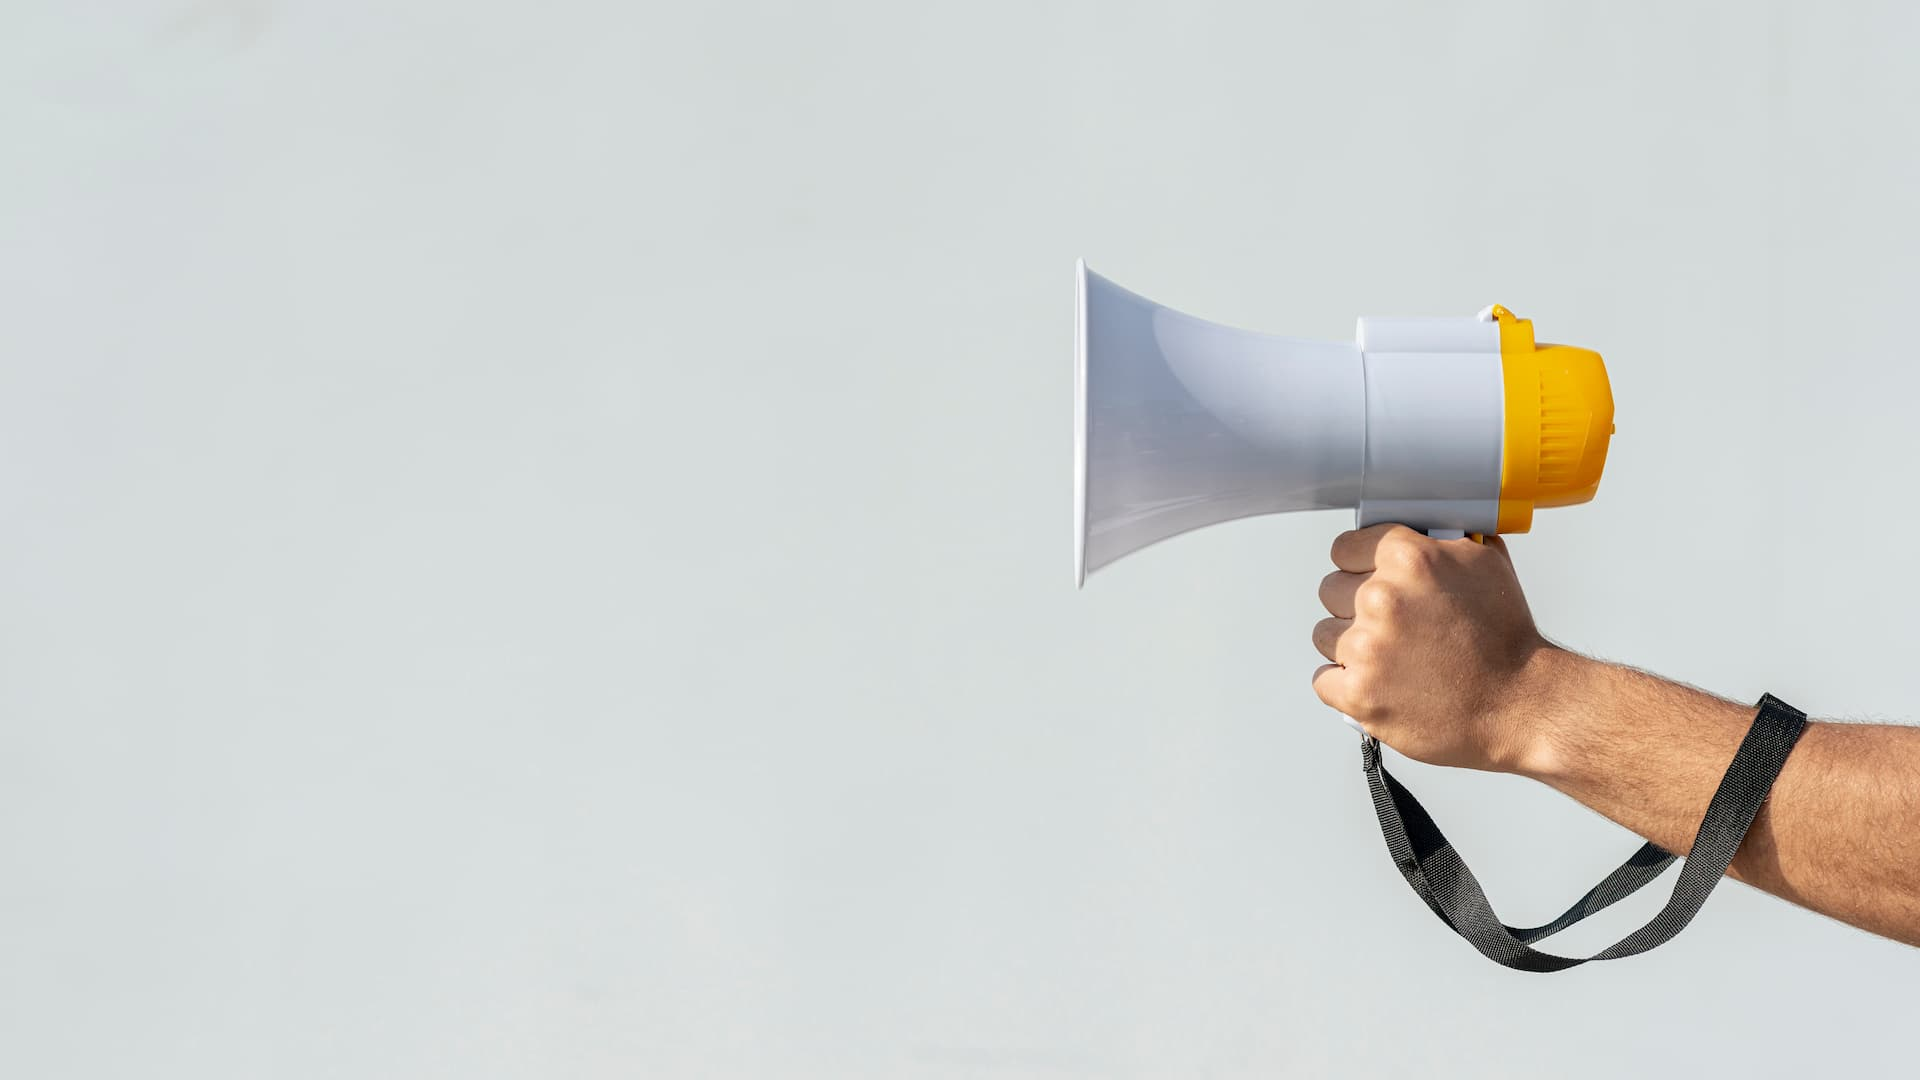 hand-holding-megaphone-for-protest-banner